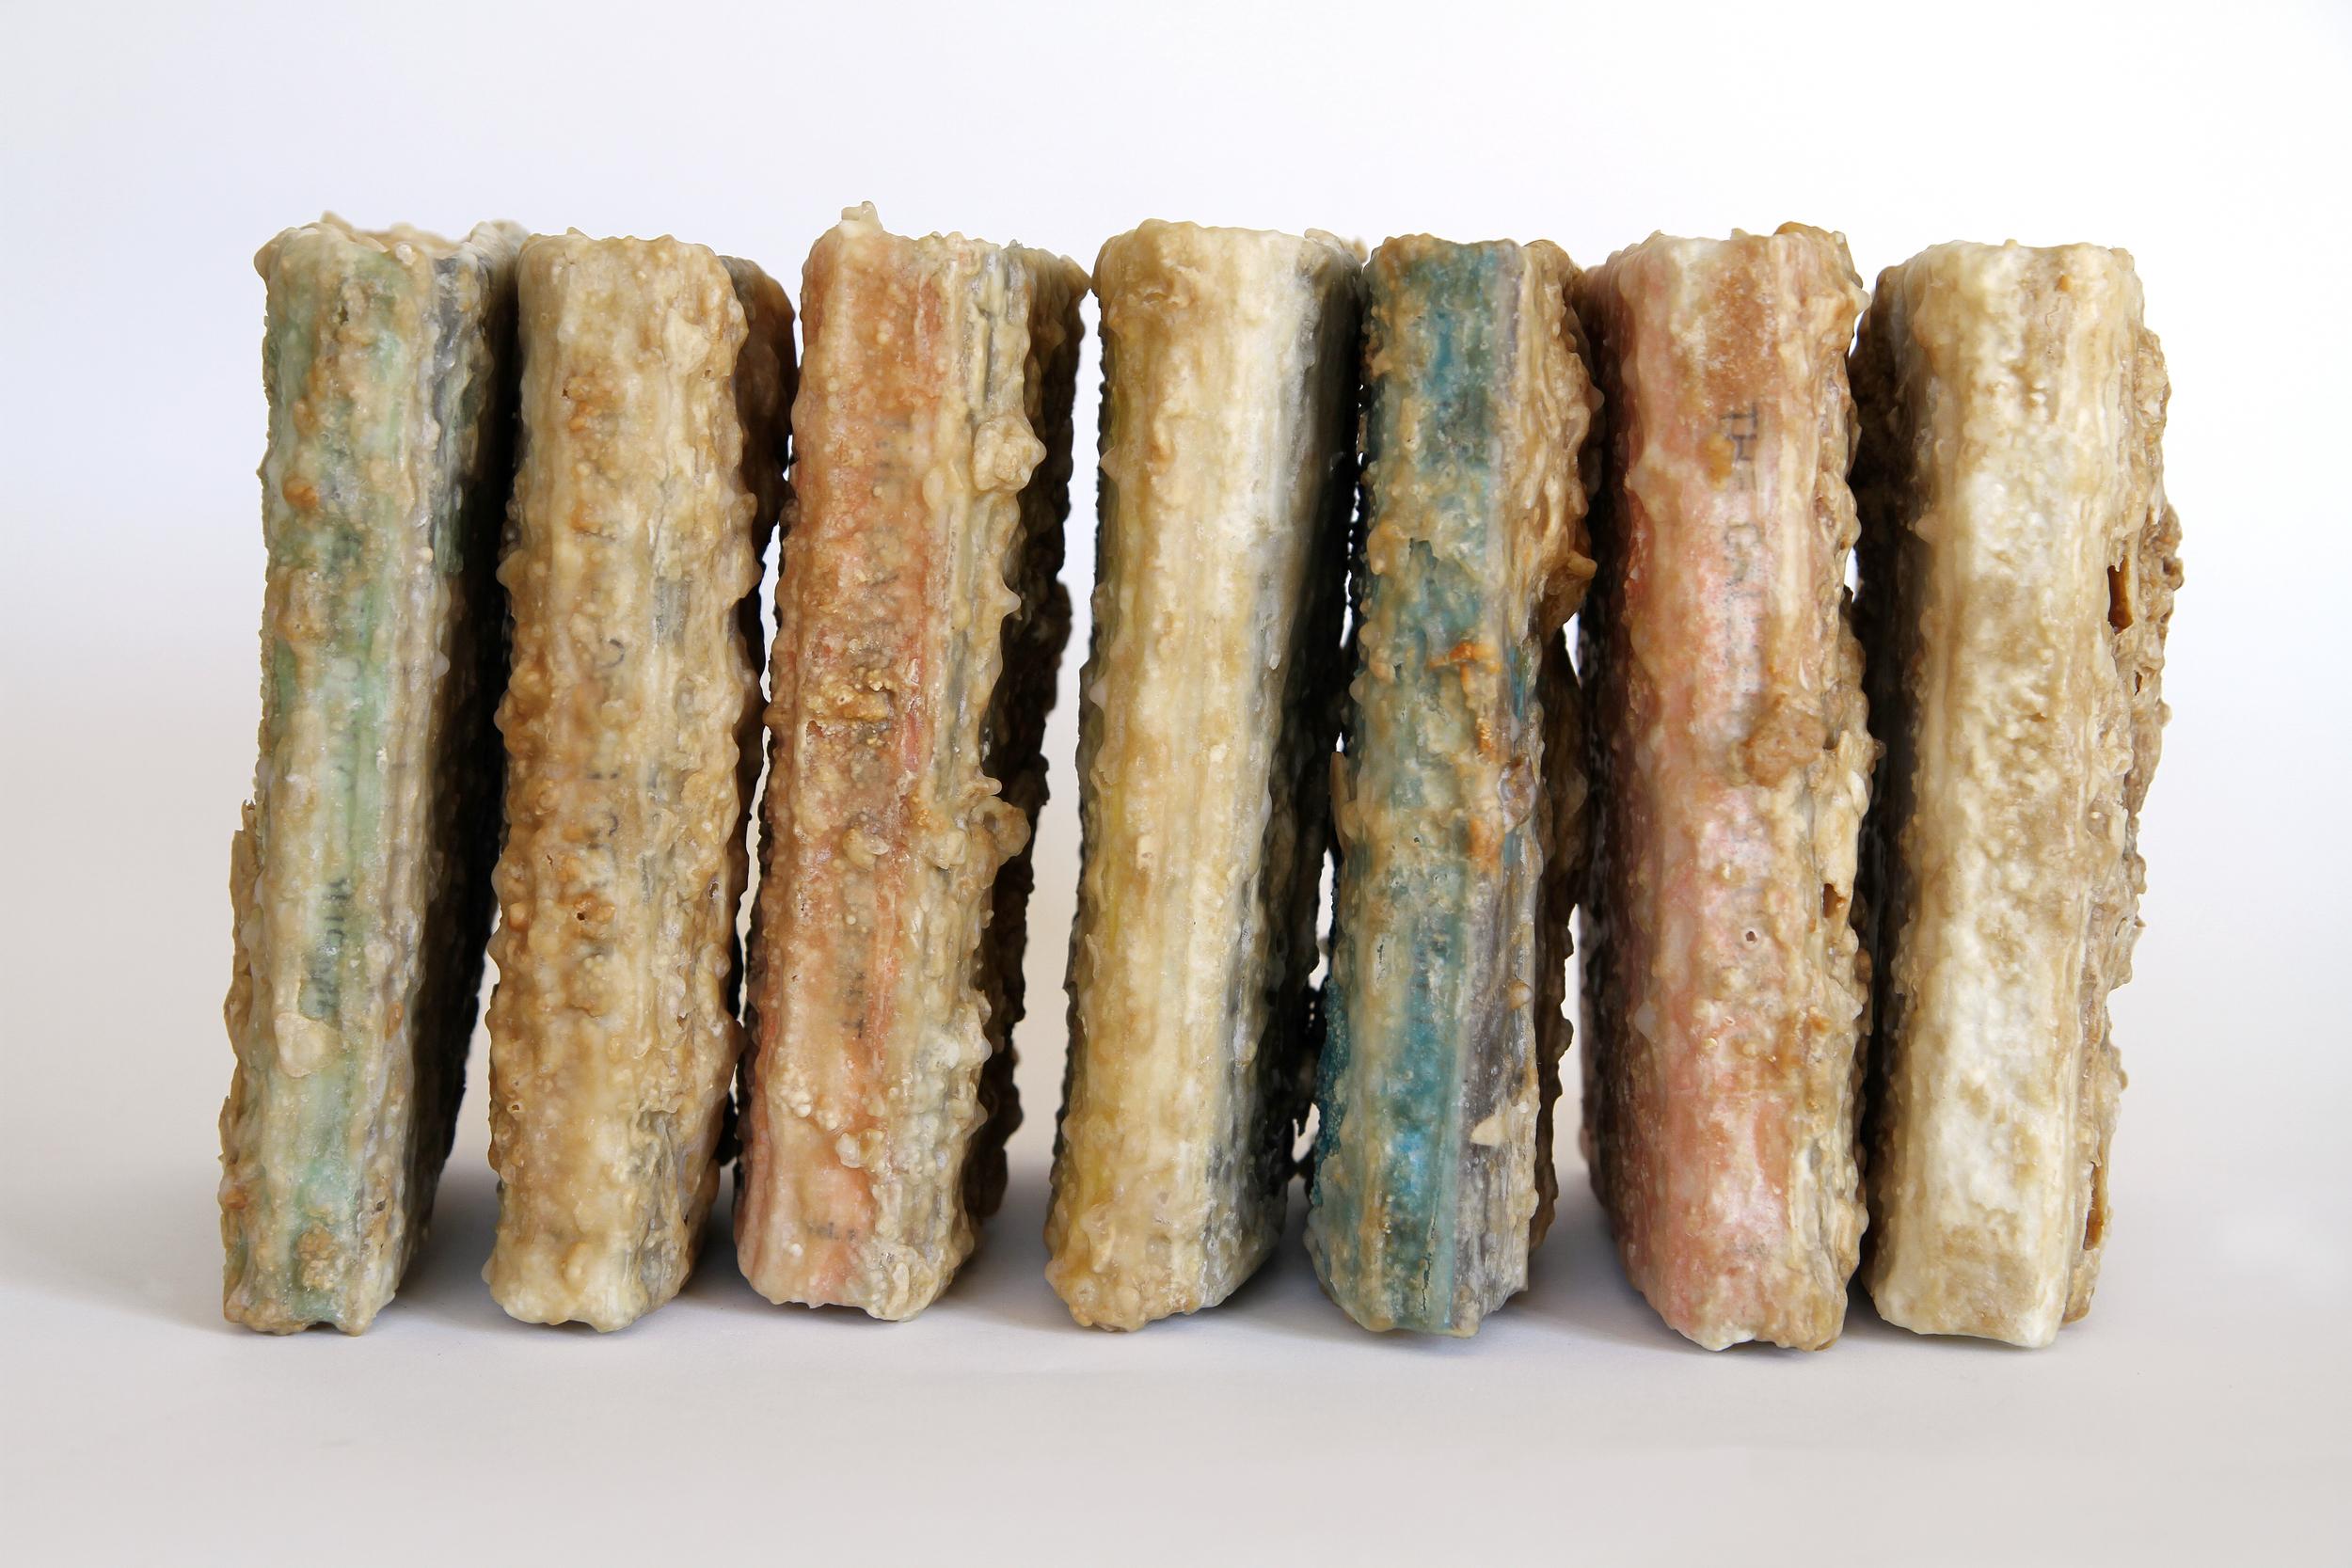 Relic (The Galloping Gourmet Television Cookbook Volume I – VII, Graham Kerr)  2013 Found book, monosodium glutamate (MSG), epoxy Dimensions variable